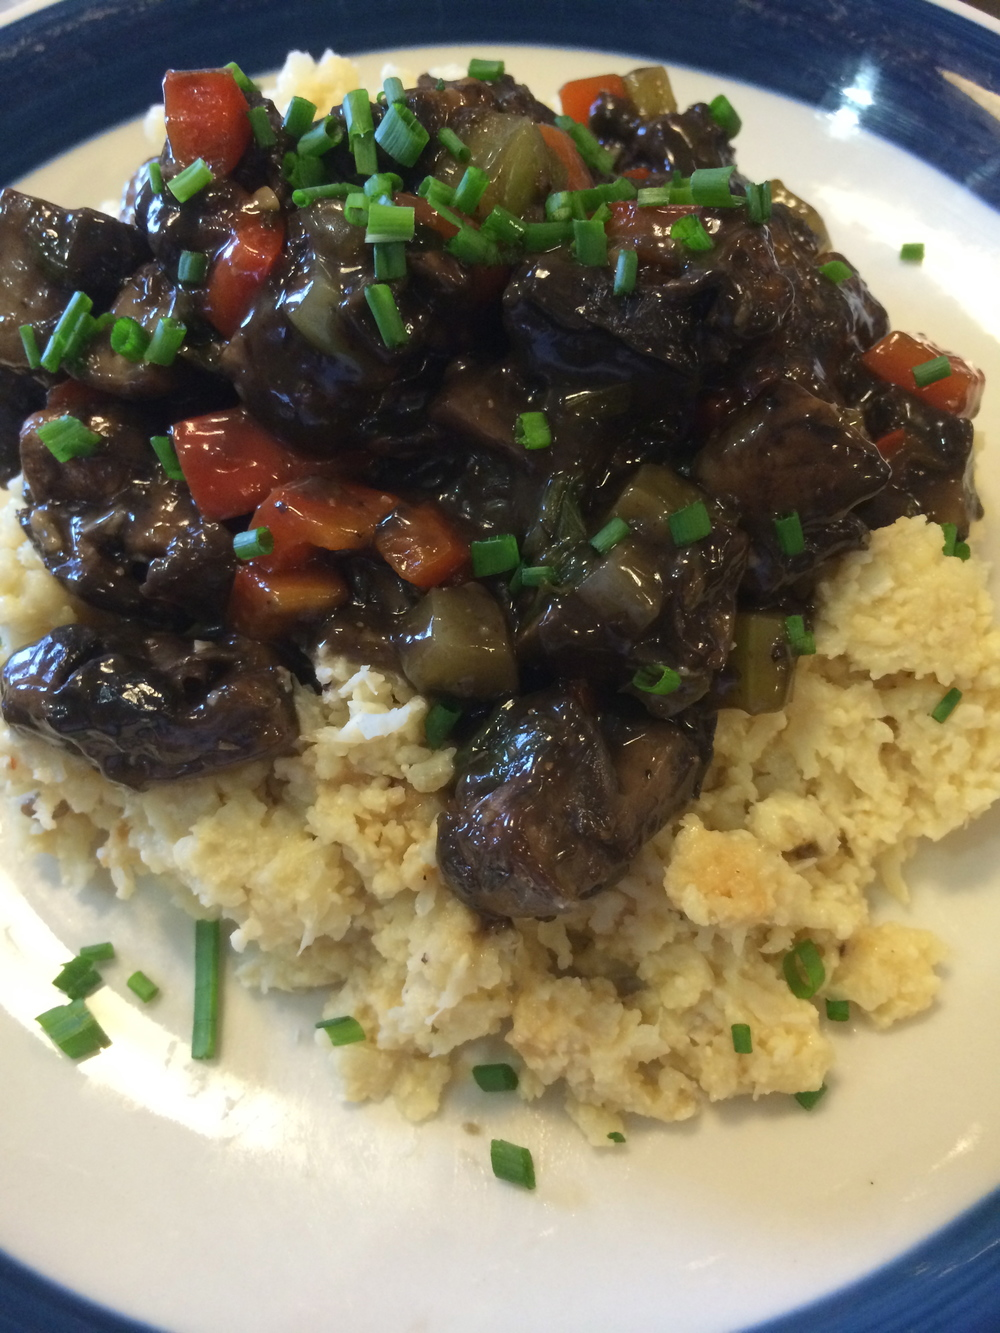 Cauliflower Grits with Mushroom Saute